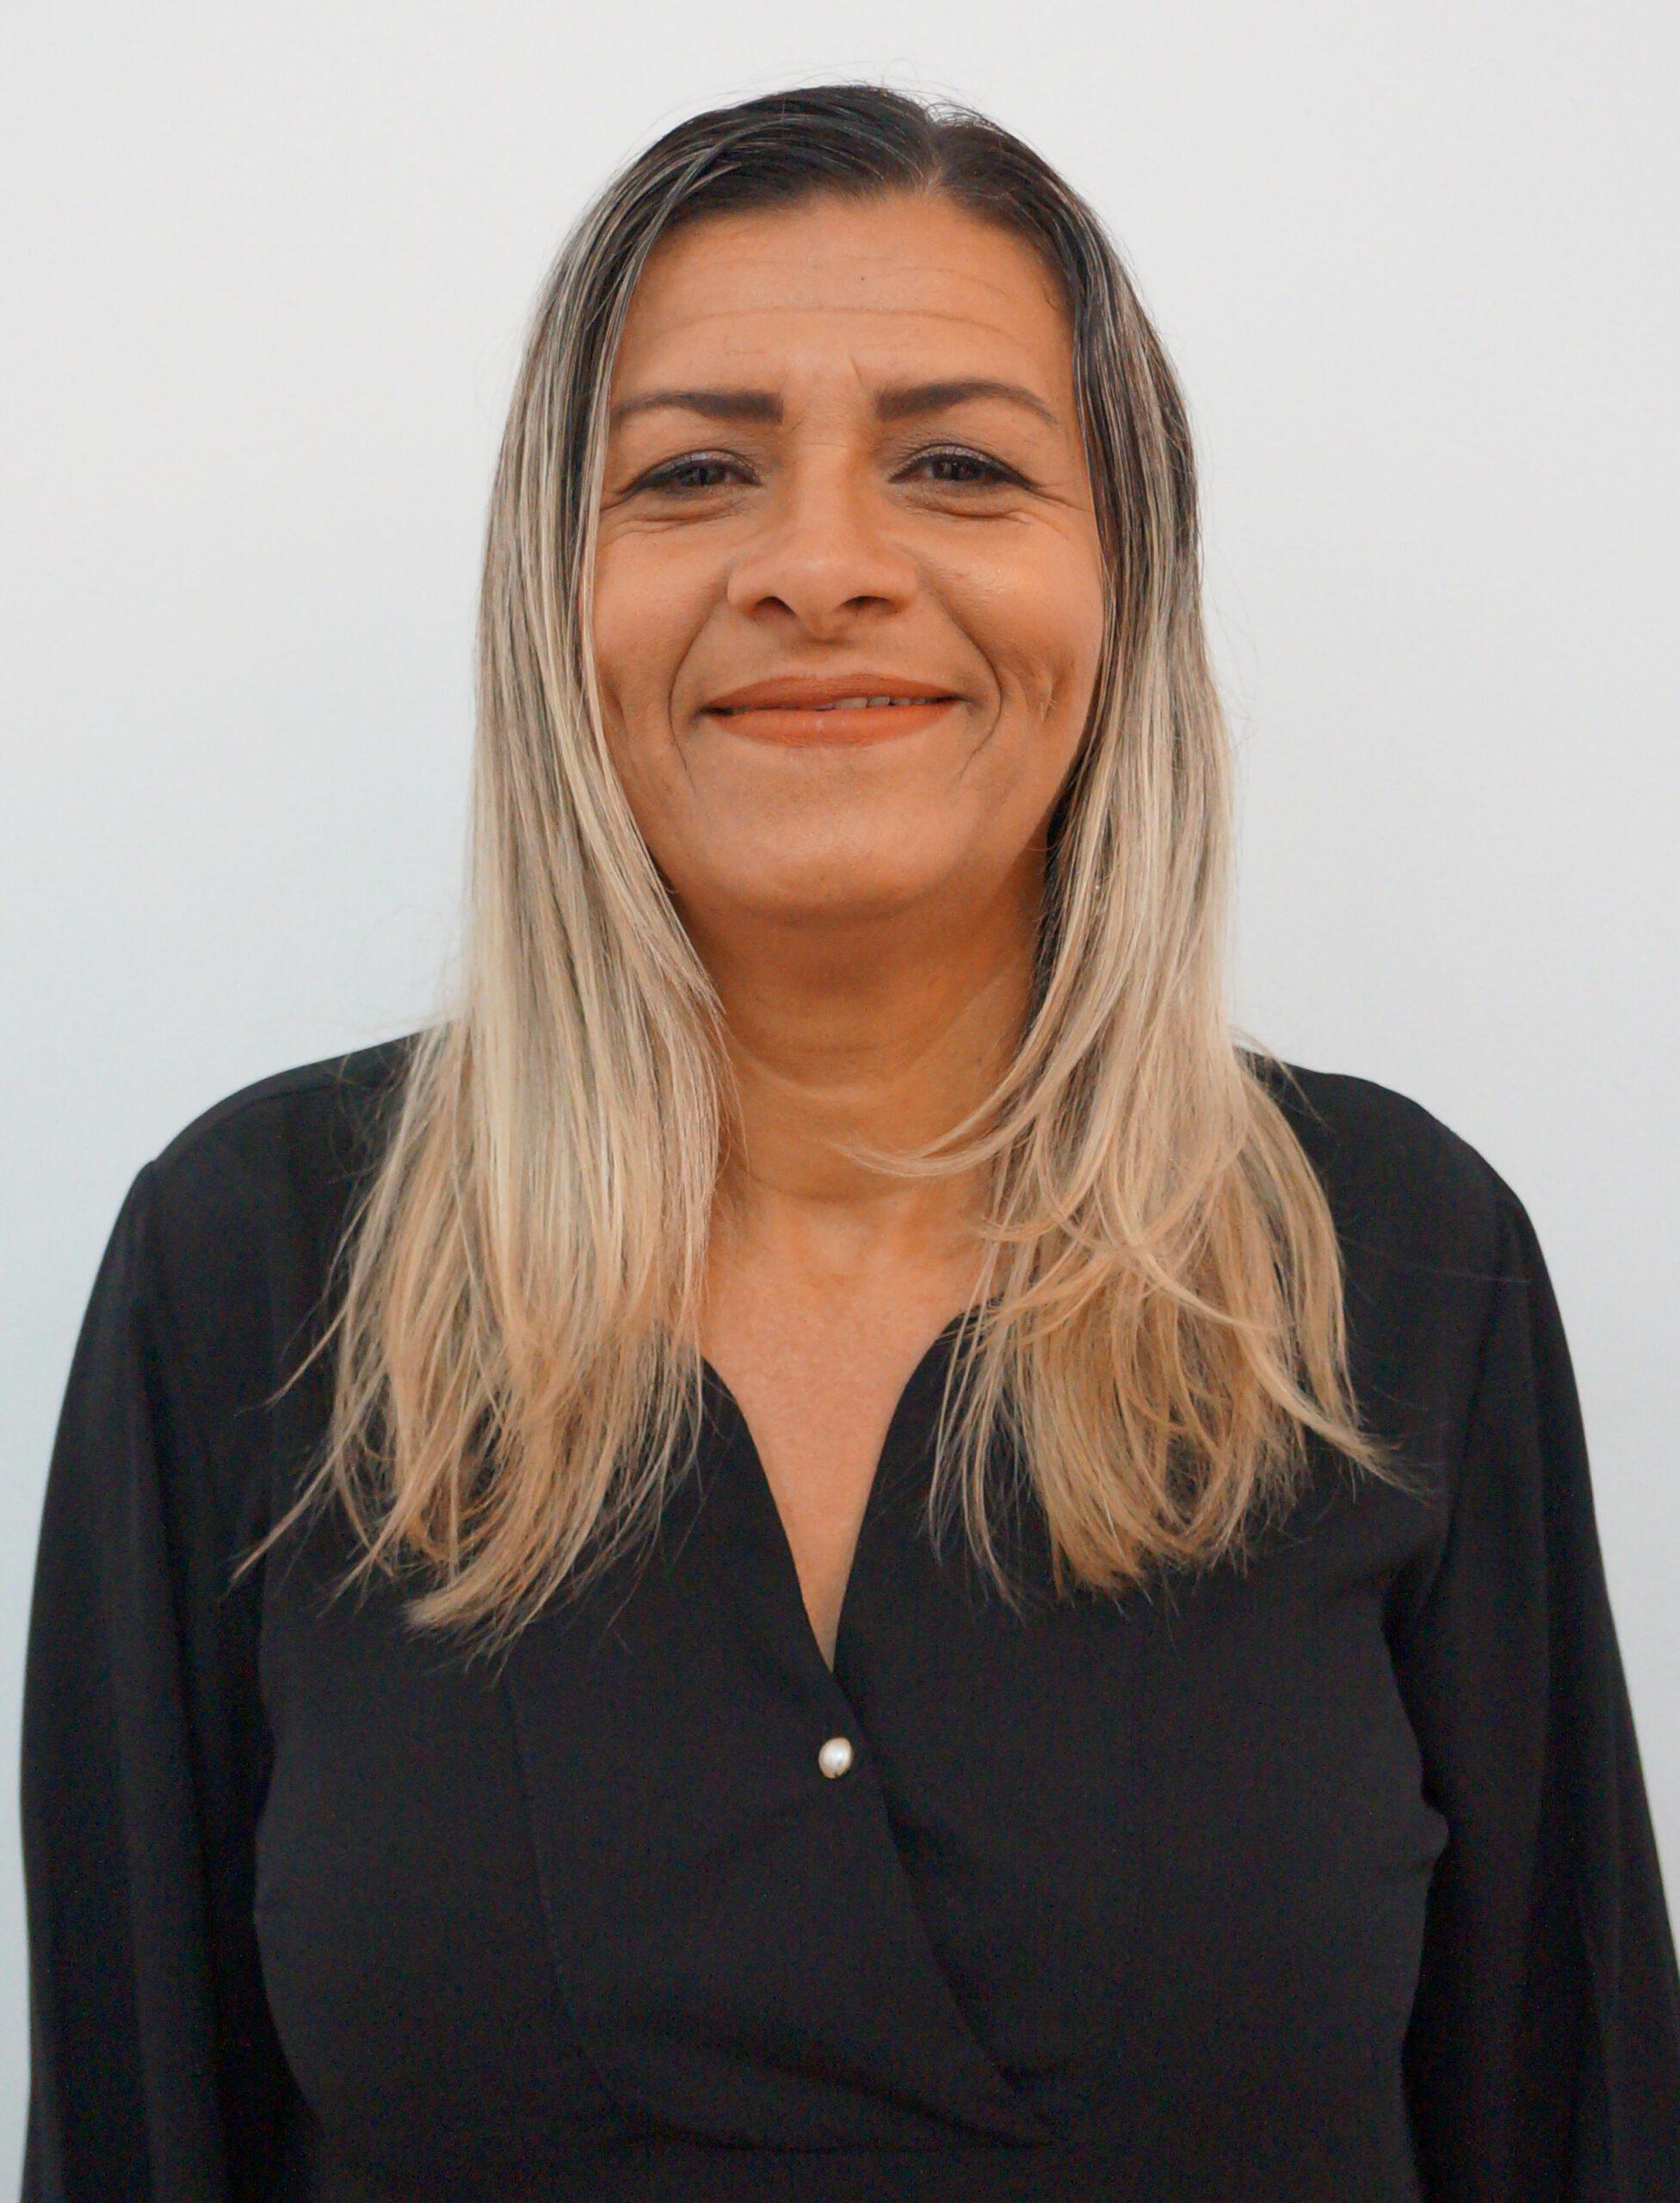 Foto Perfil Maria de Fátima Laurindo